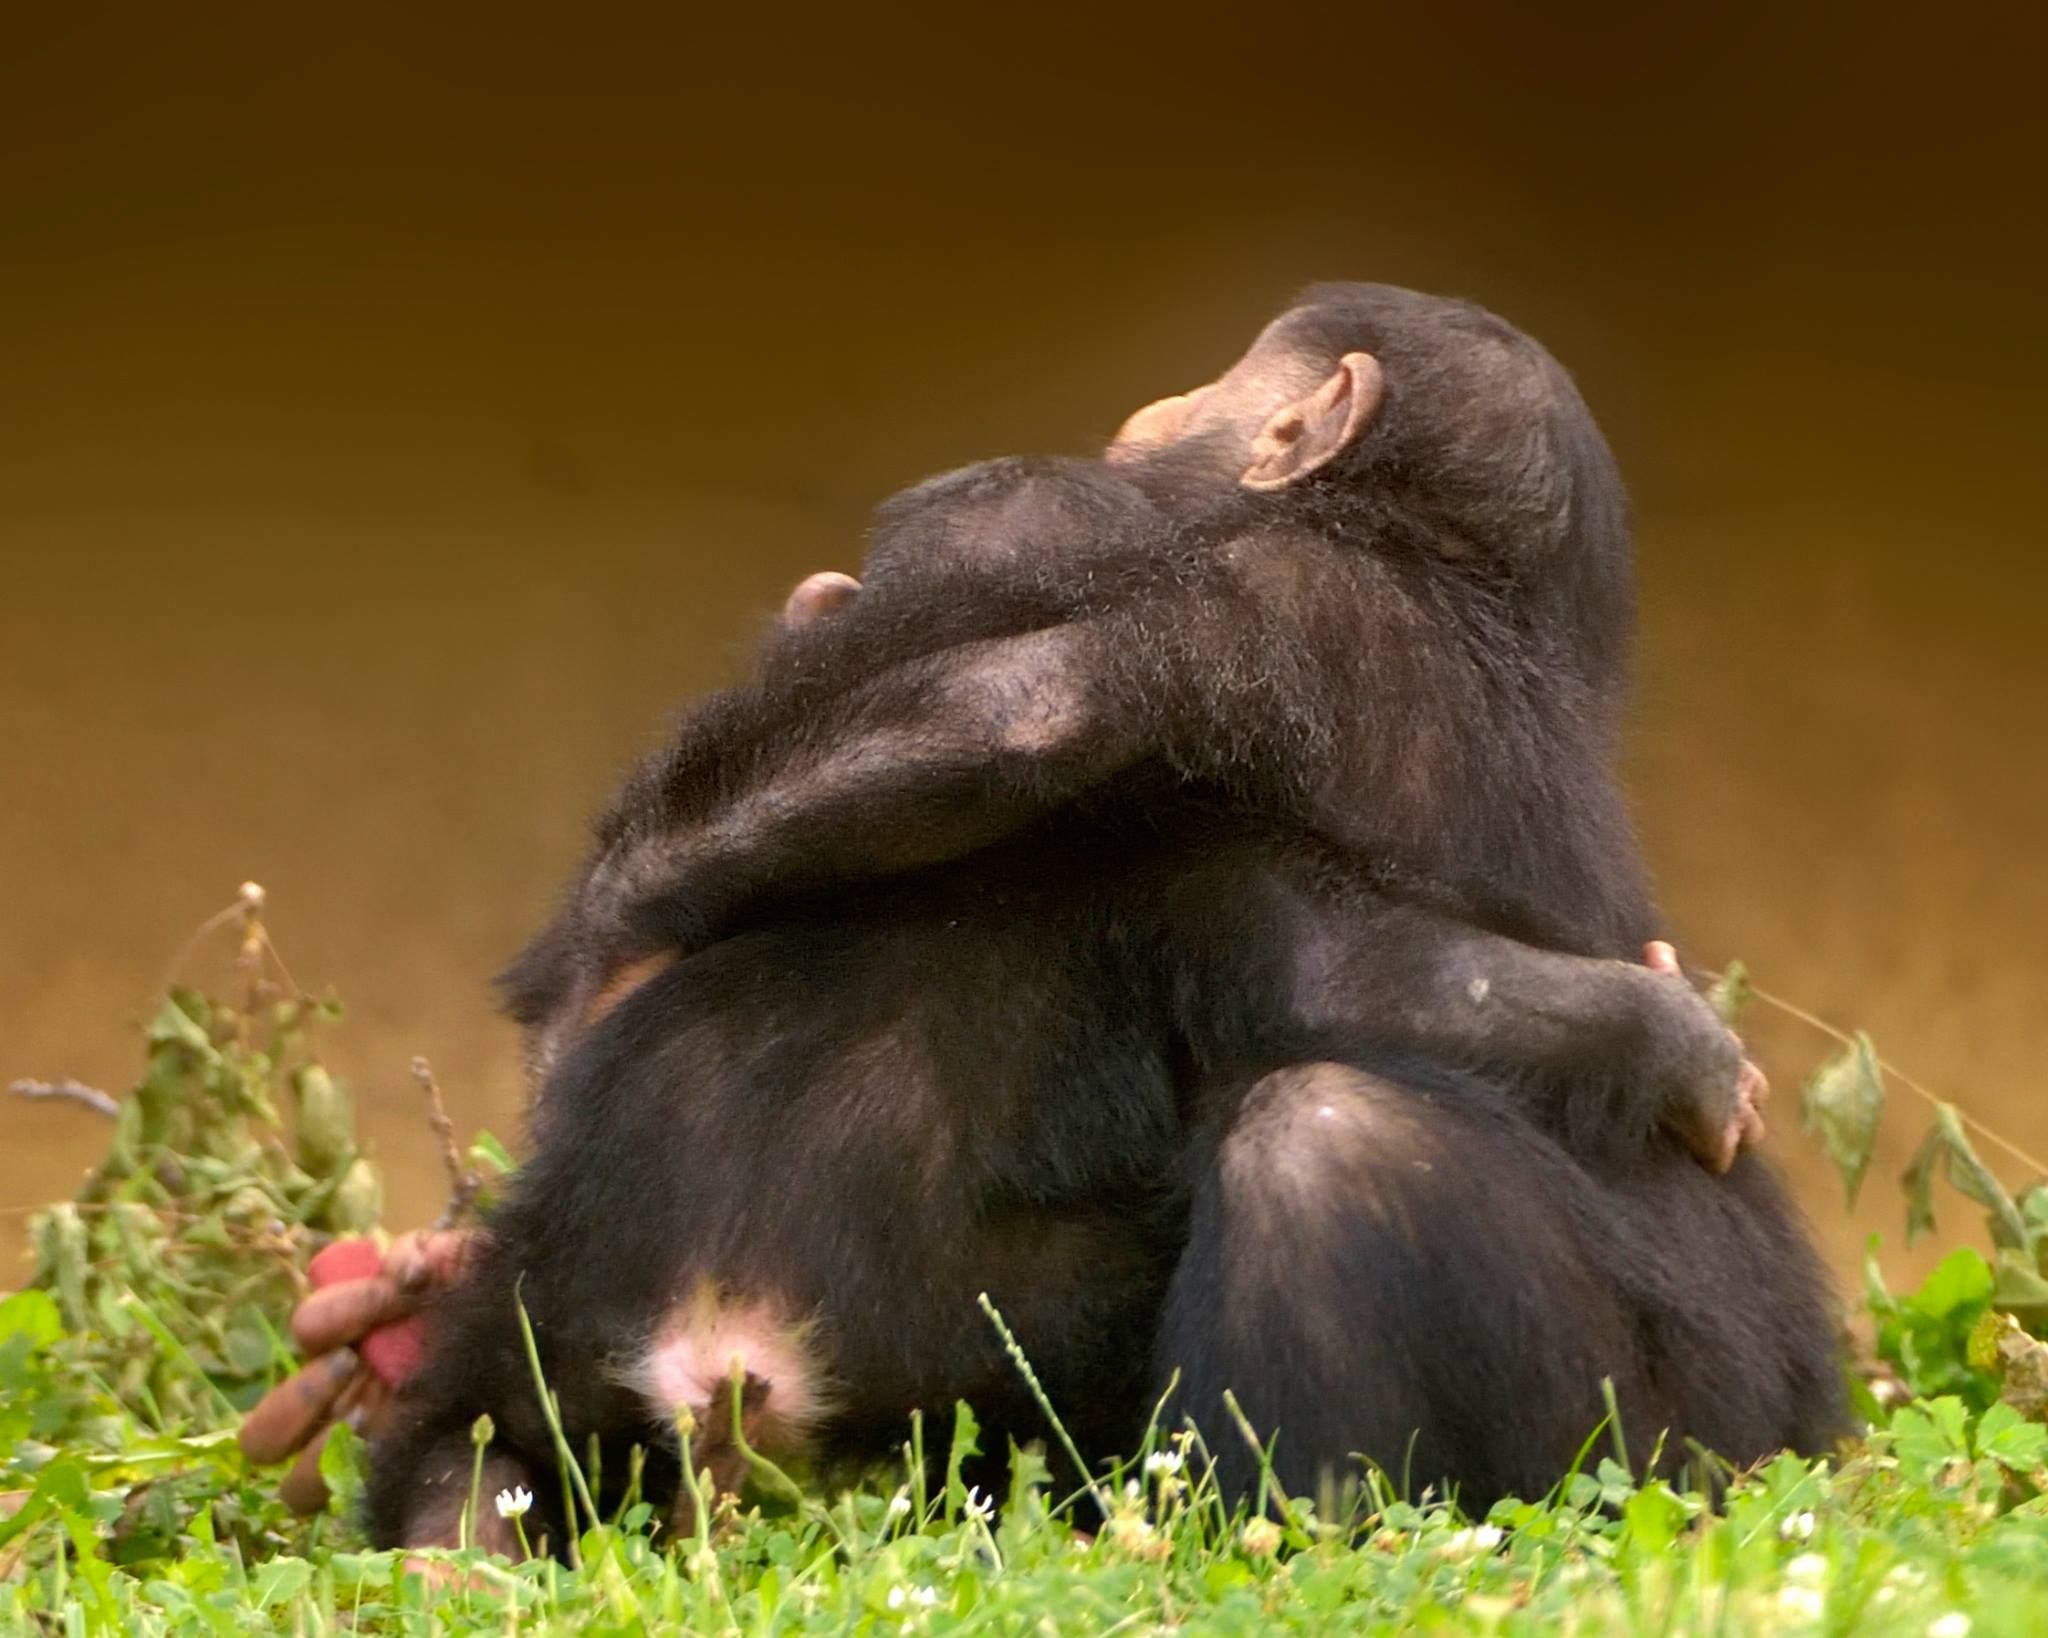 Chimp hug | Critters | Baby chimpanzee, Ape monkey, Primates